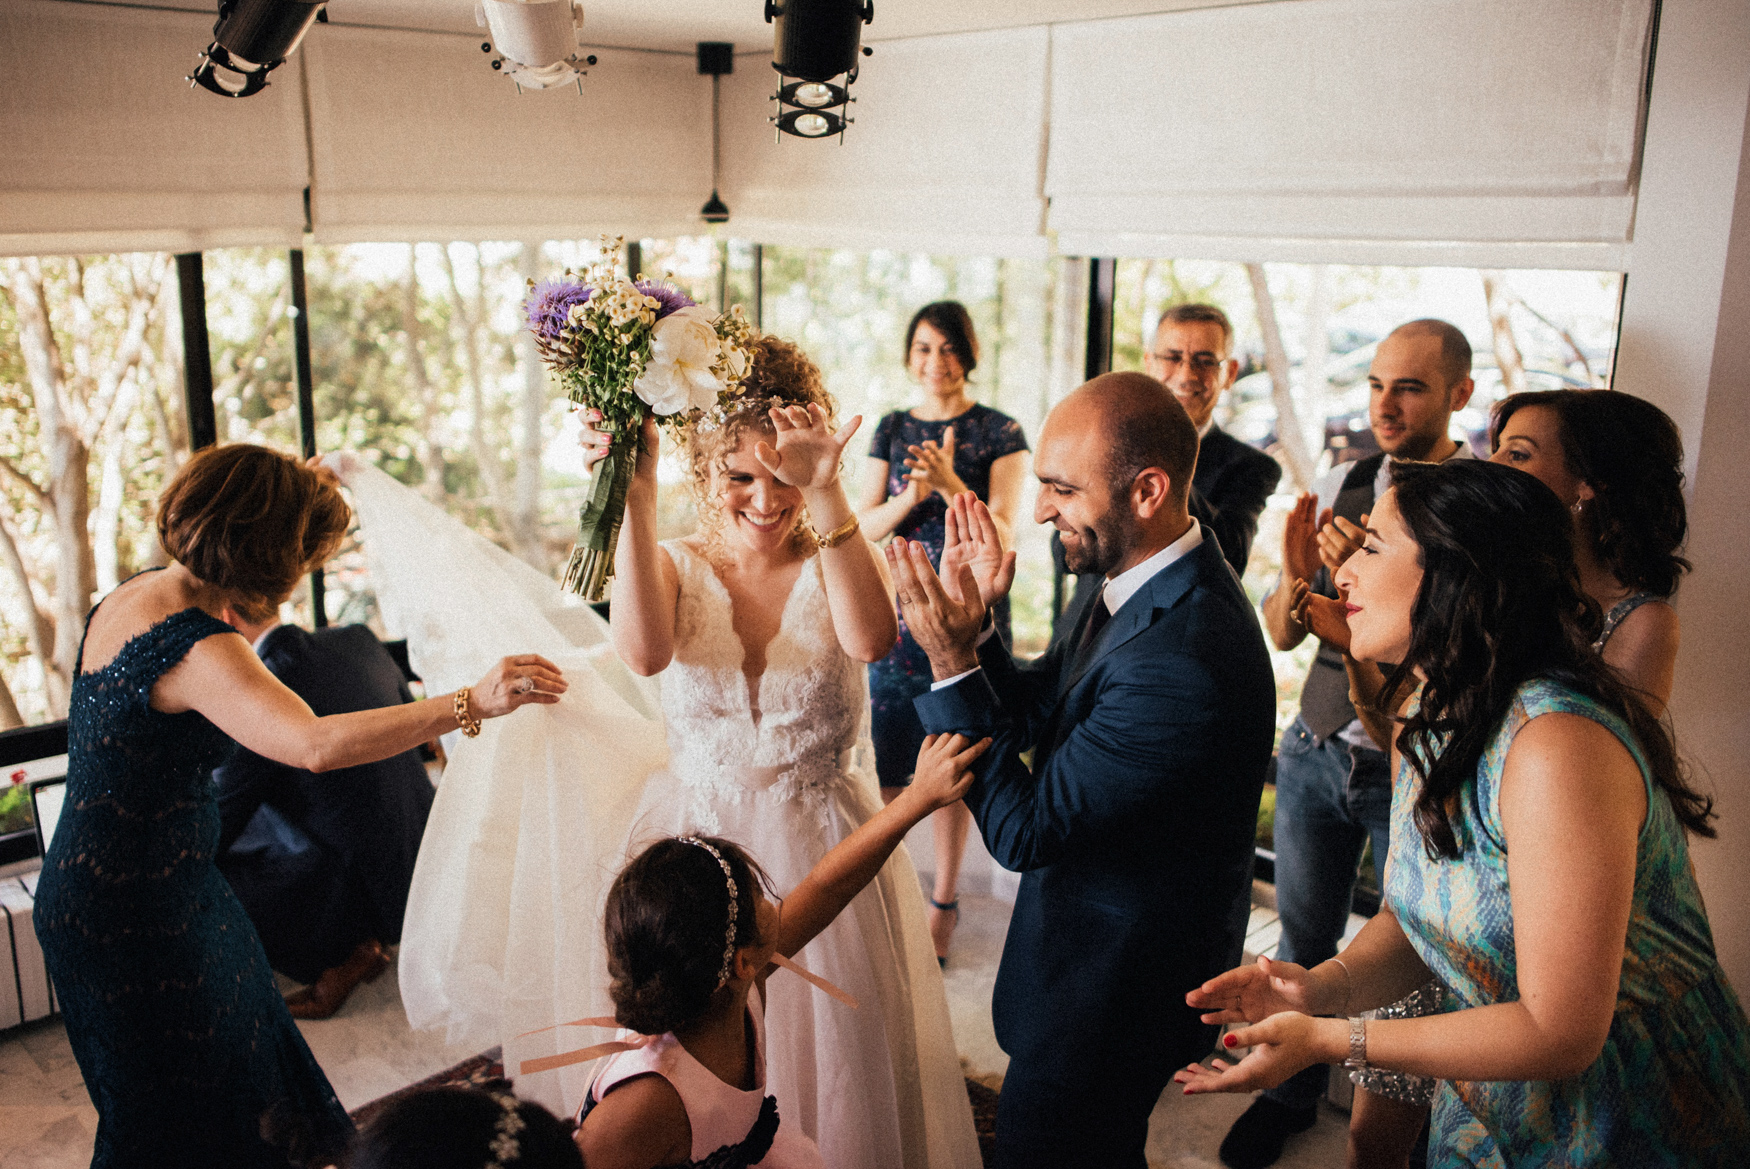 LR2 beirut byblos wedding photographer lebanon 027.jpg